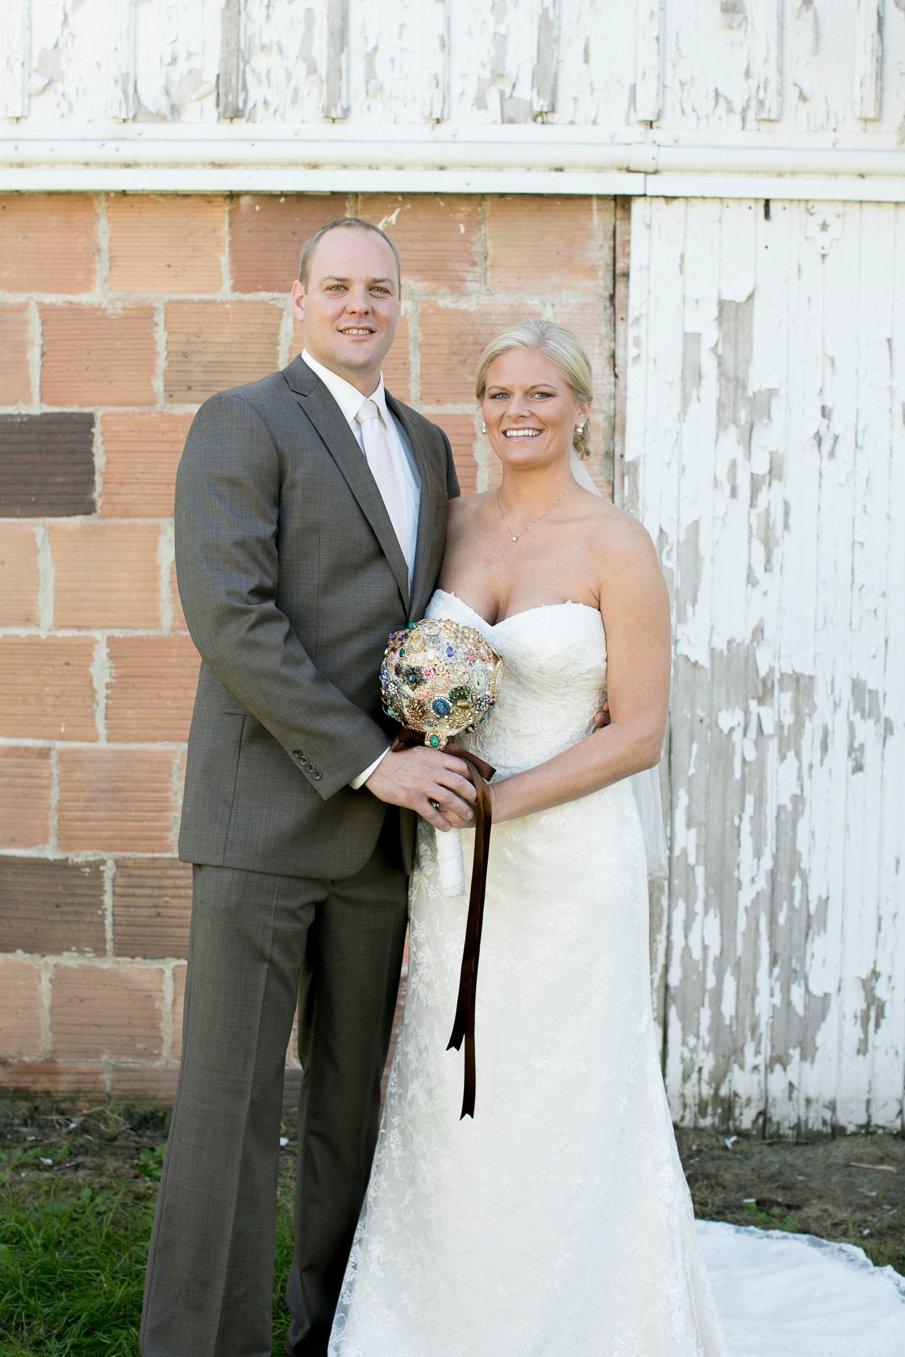 Alice Hq Photography | Scott + Jen | Southern MN Wedding17.jpg